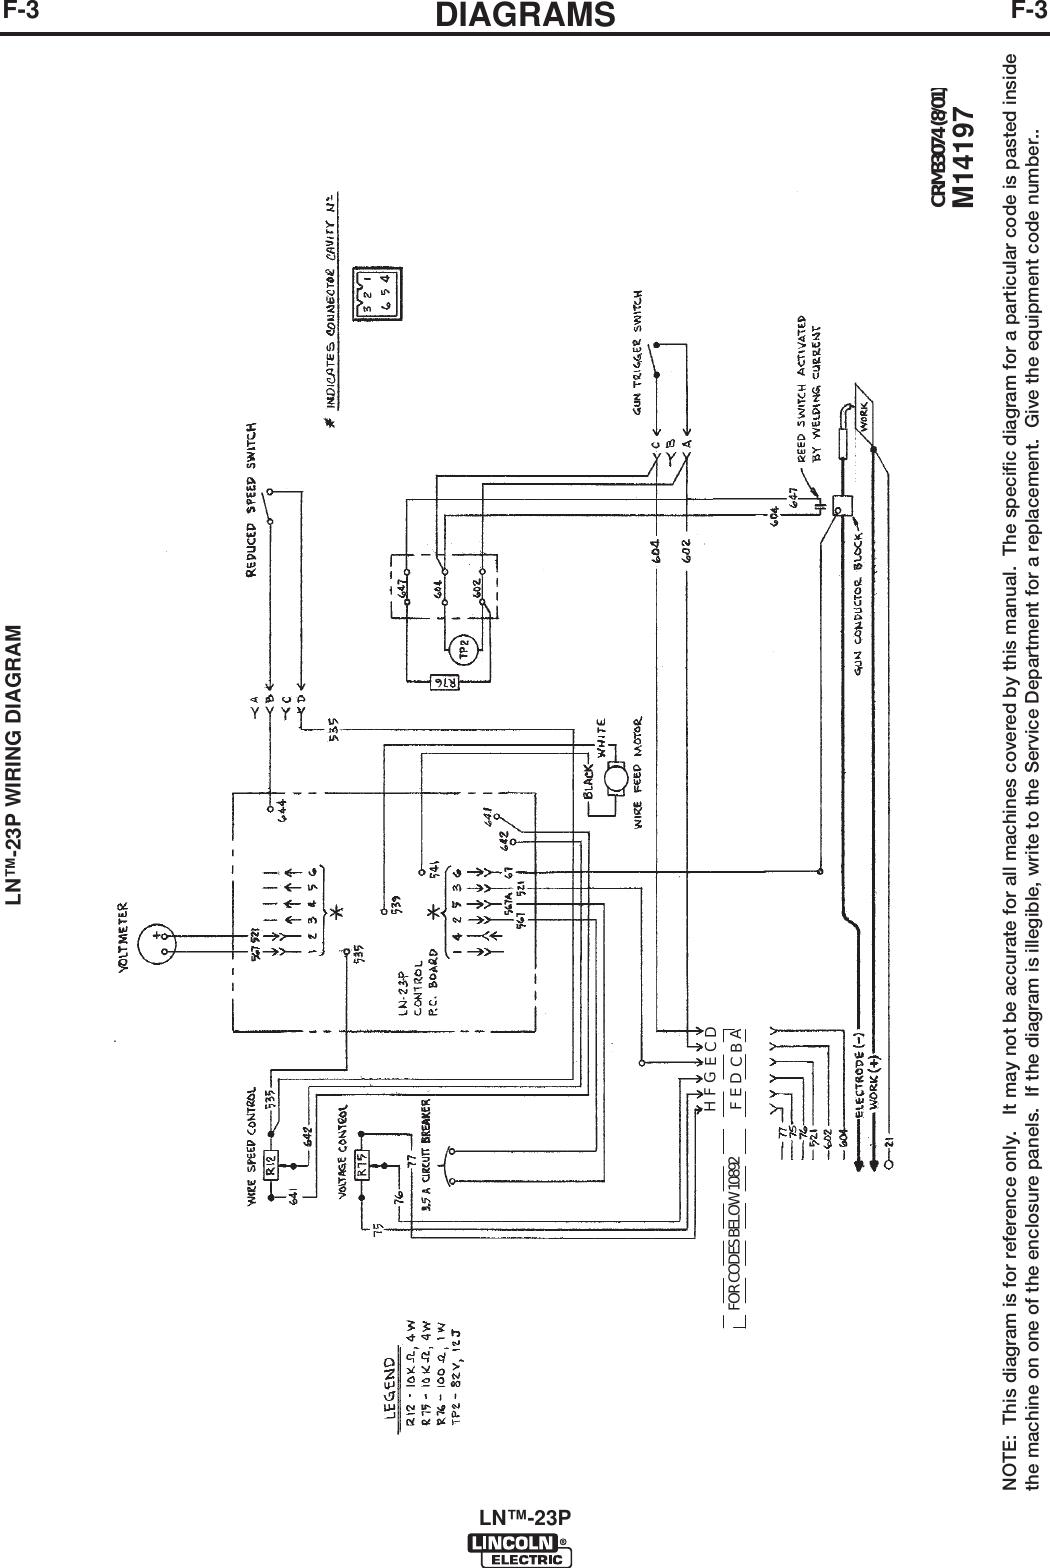 Lincoln Ranger 250 Welder Parts On Sa 200 Remote Wiring Diagram